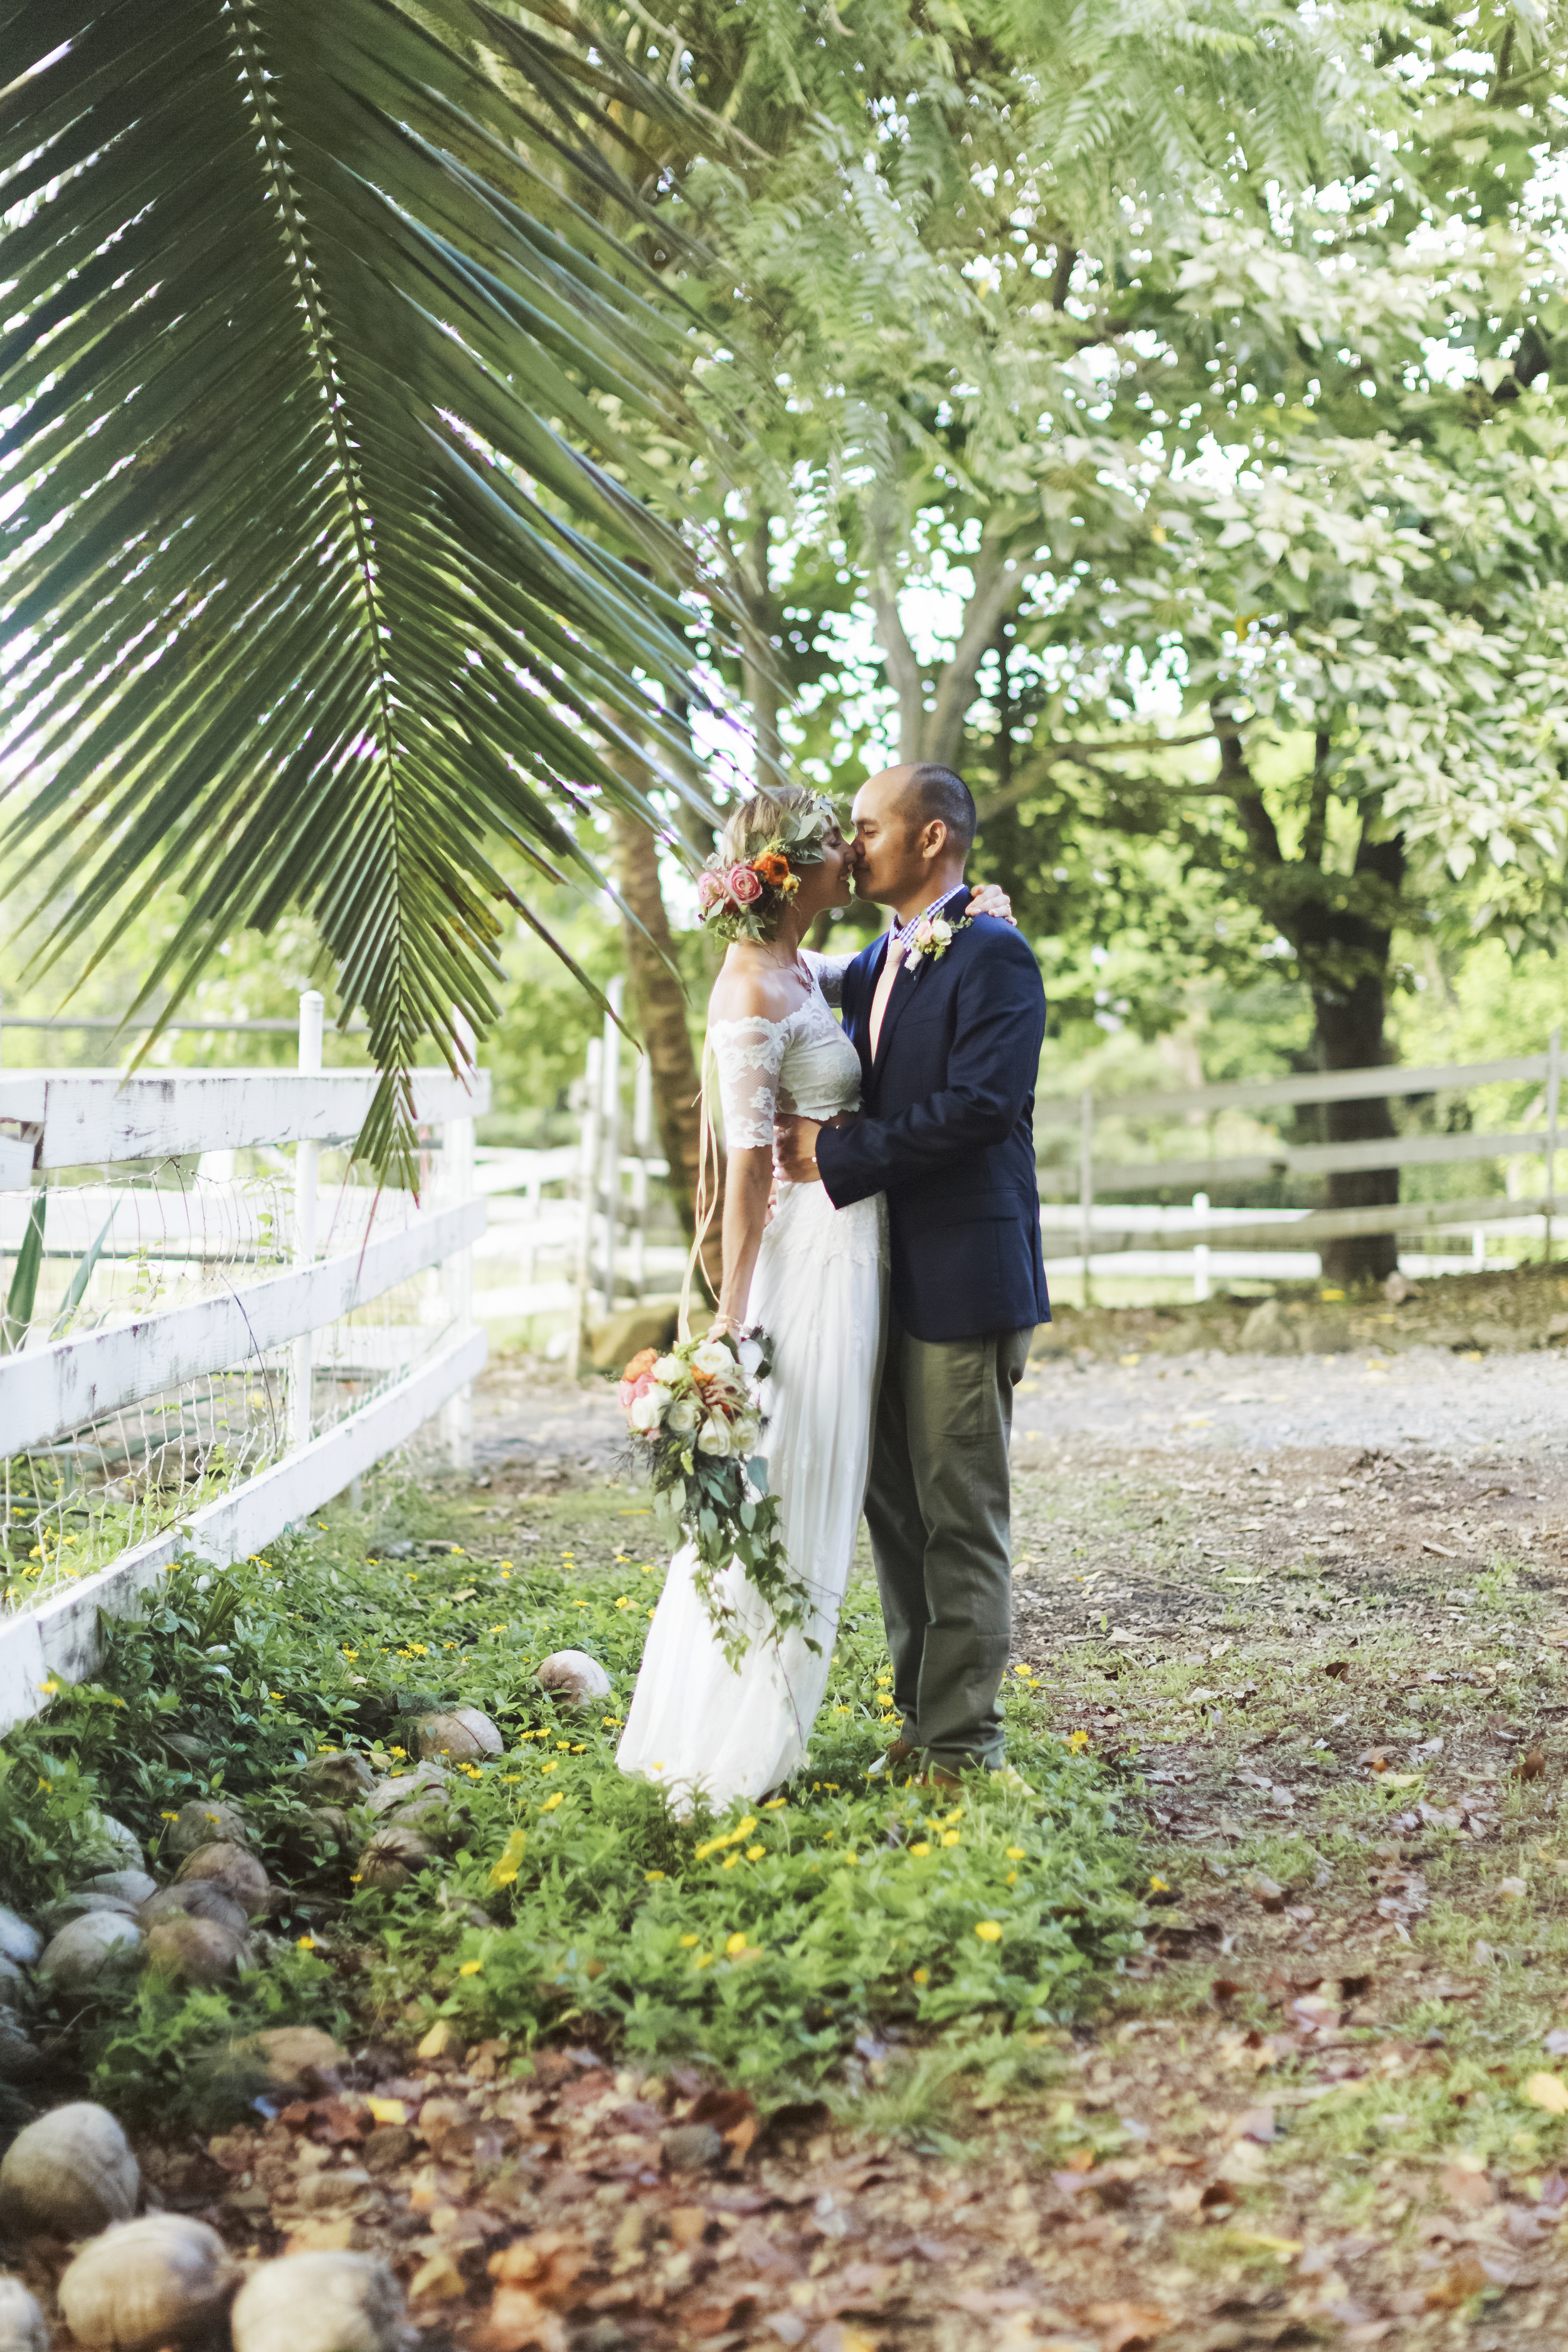 angie-diaz-photography-oahu-hawaii-wedding-tradewinds-ranch-79.jpg